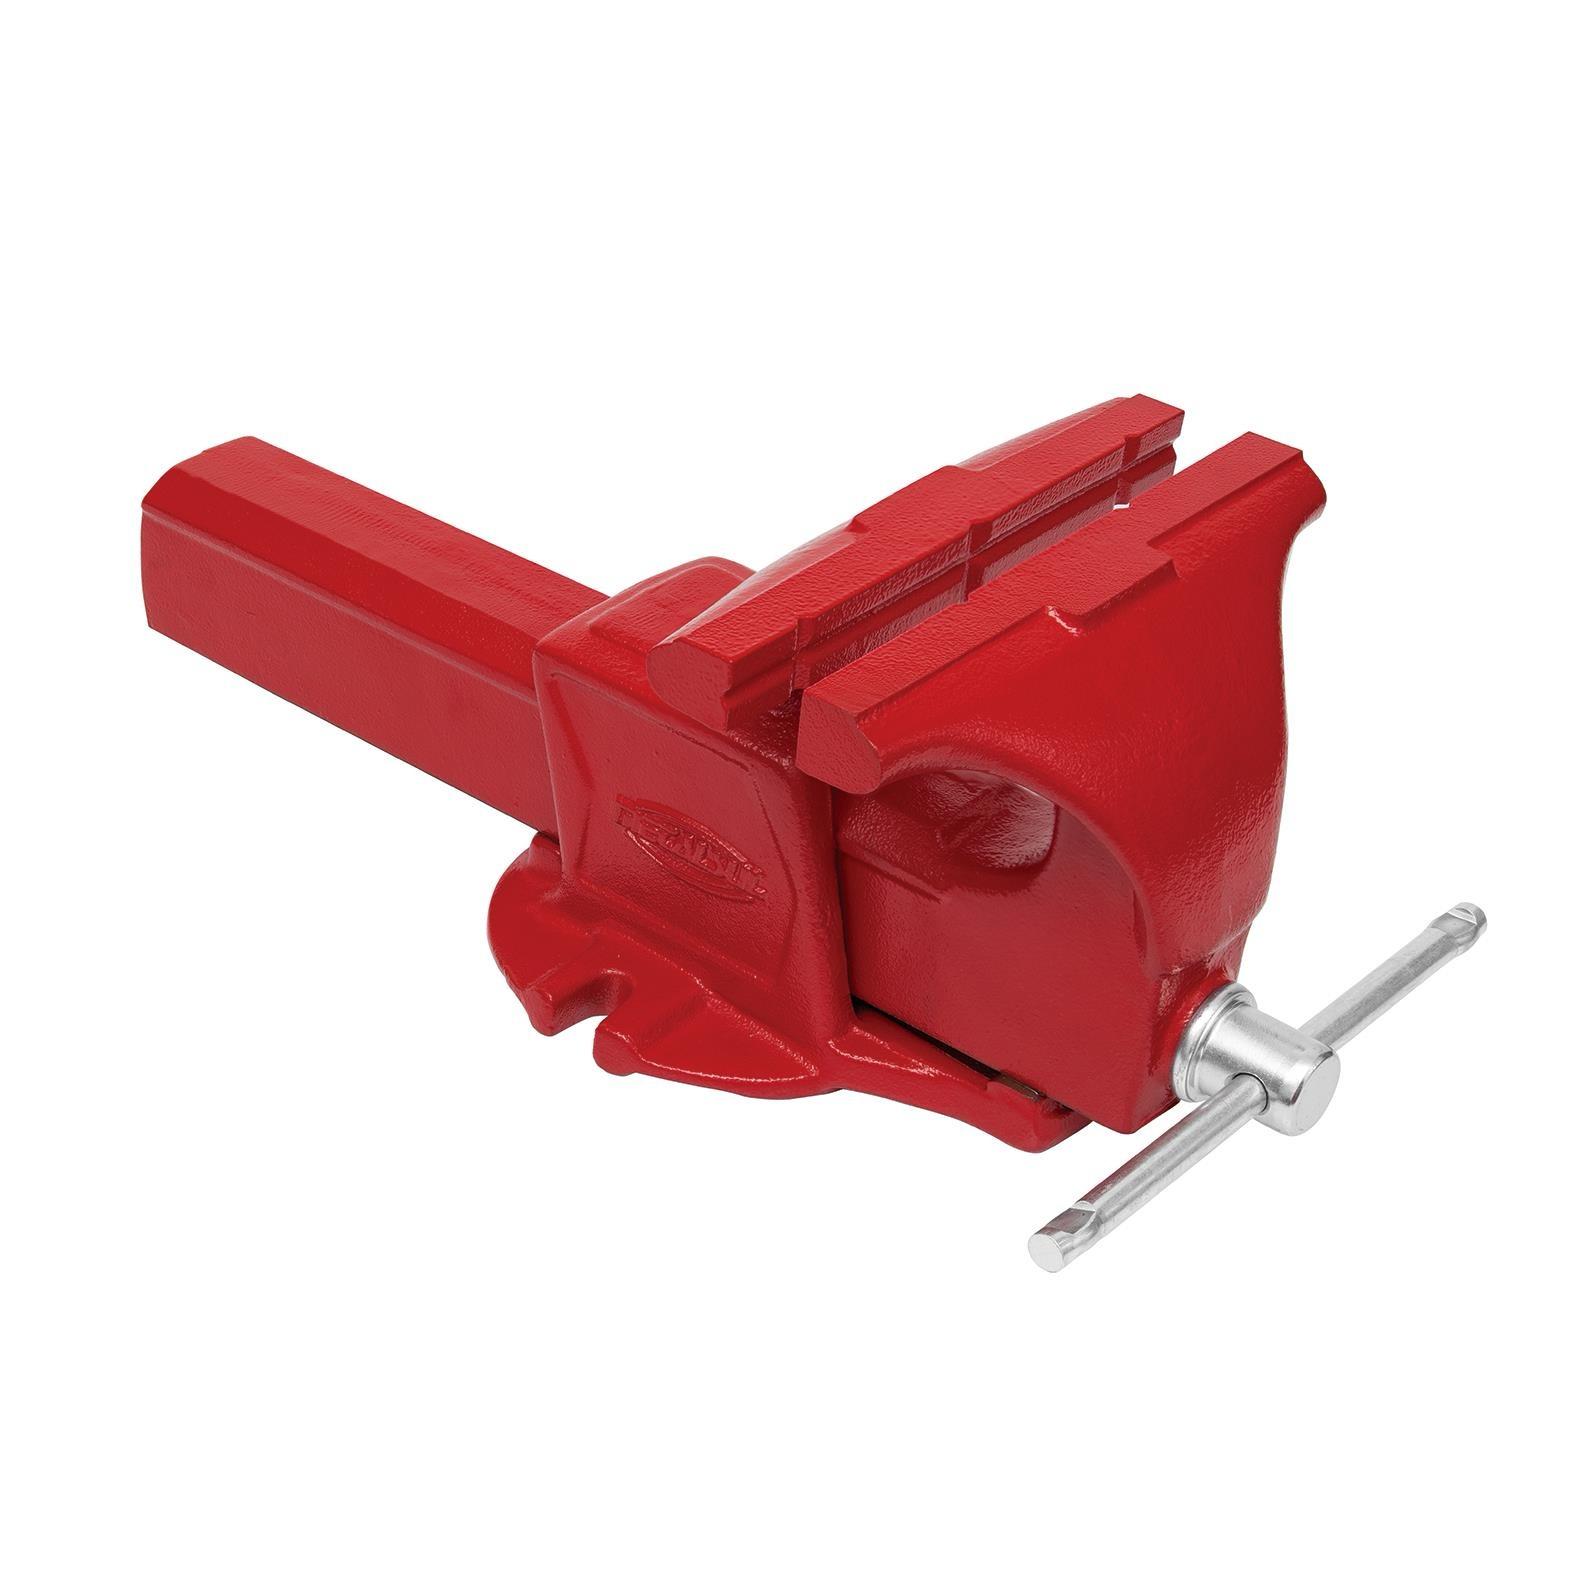 Torno de Bancada N 6 15240mm - TMF06 - Metalsul